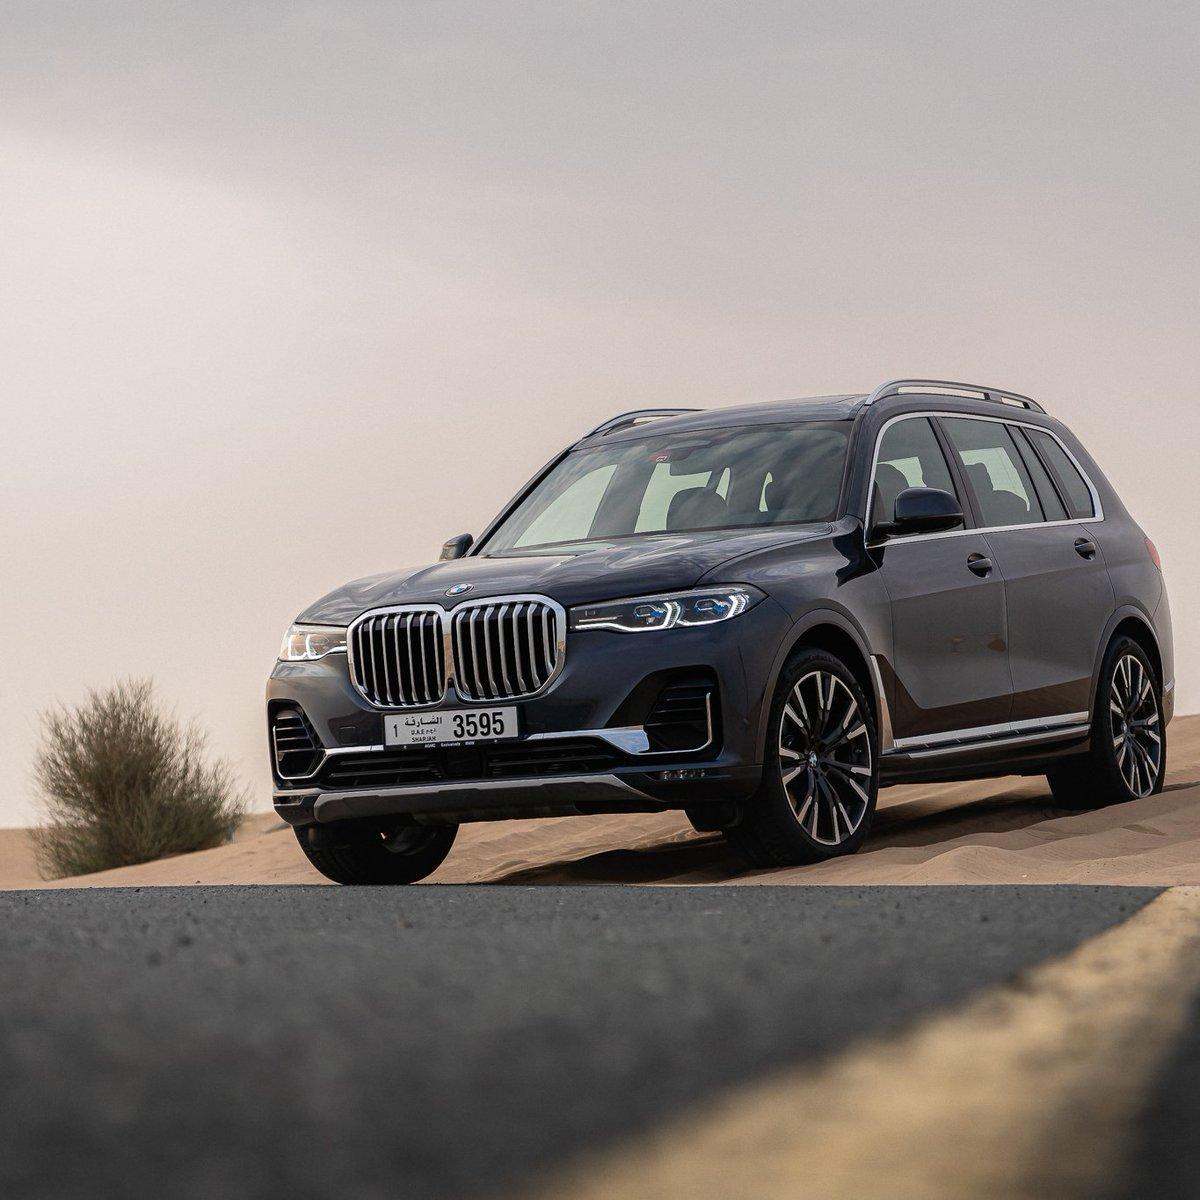 Desert drives in The X7. 🔥 Where should we take this beauty next?  #BMWX7 #BMWAGMC #XDrive40i #BMWuae #BMW #mydubai #uae #desert #dubai